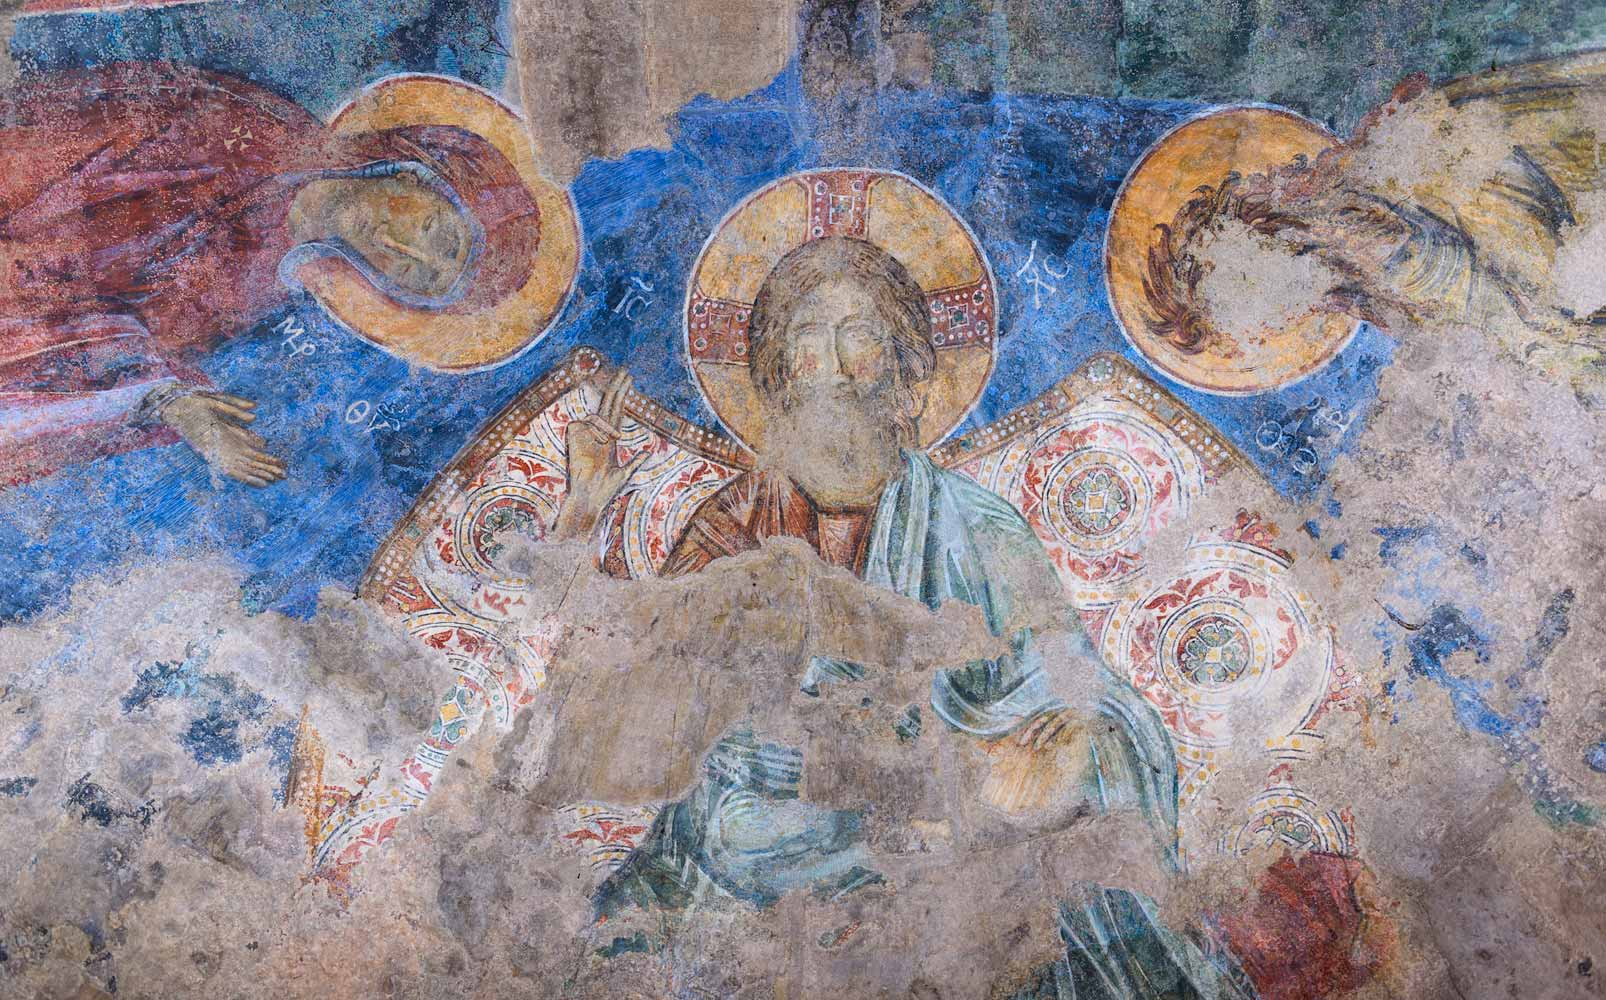 monastere-abu-gosh-deisis